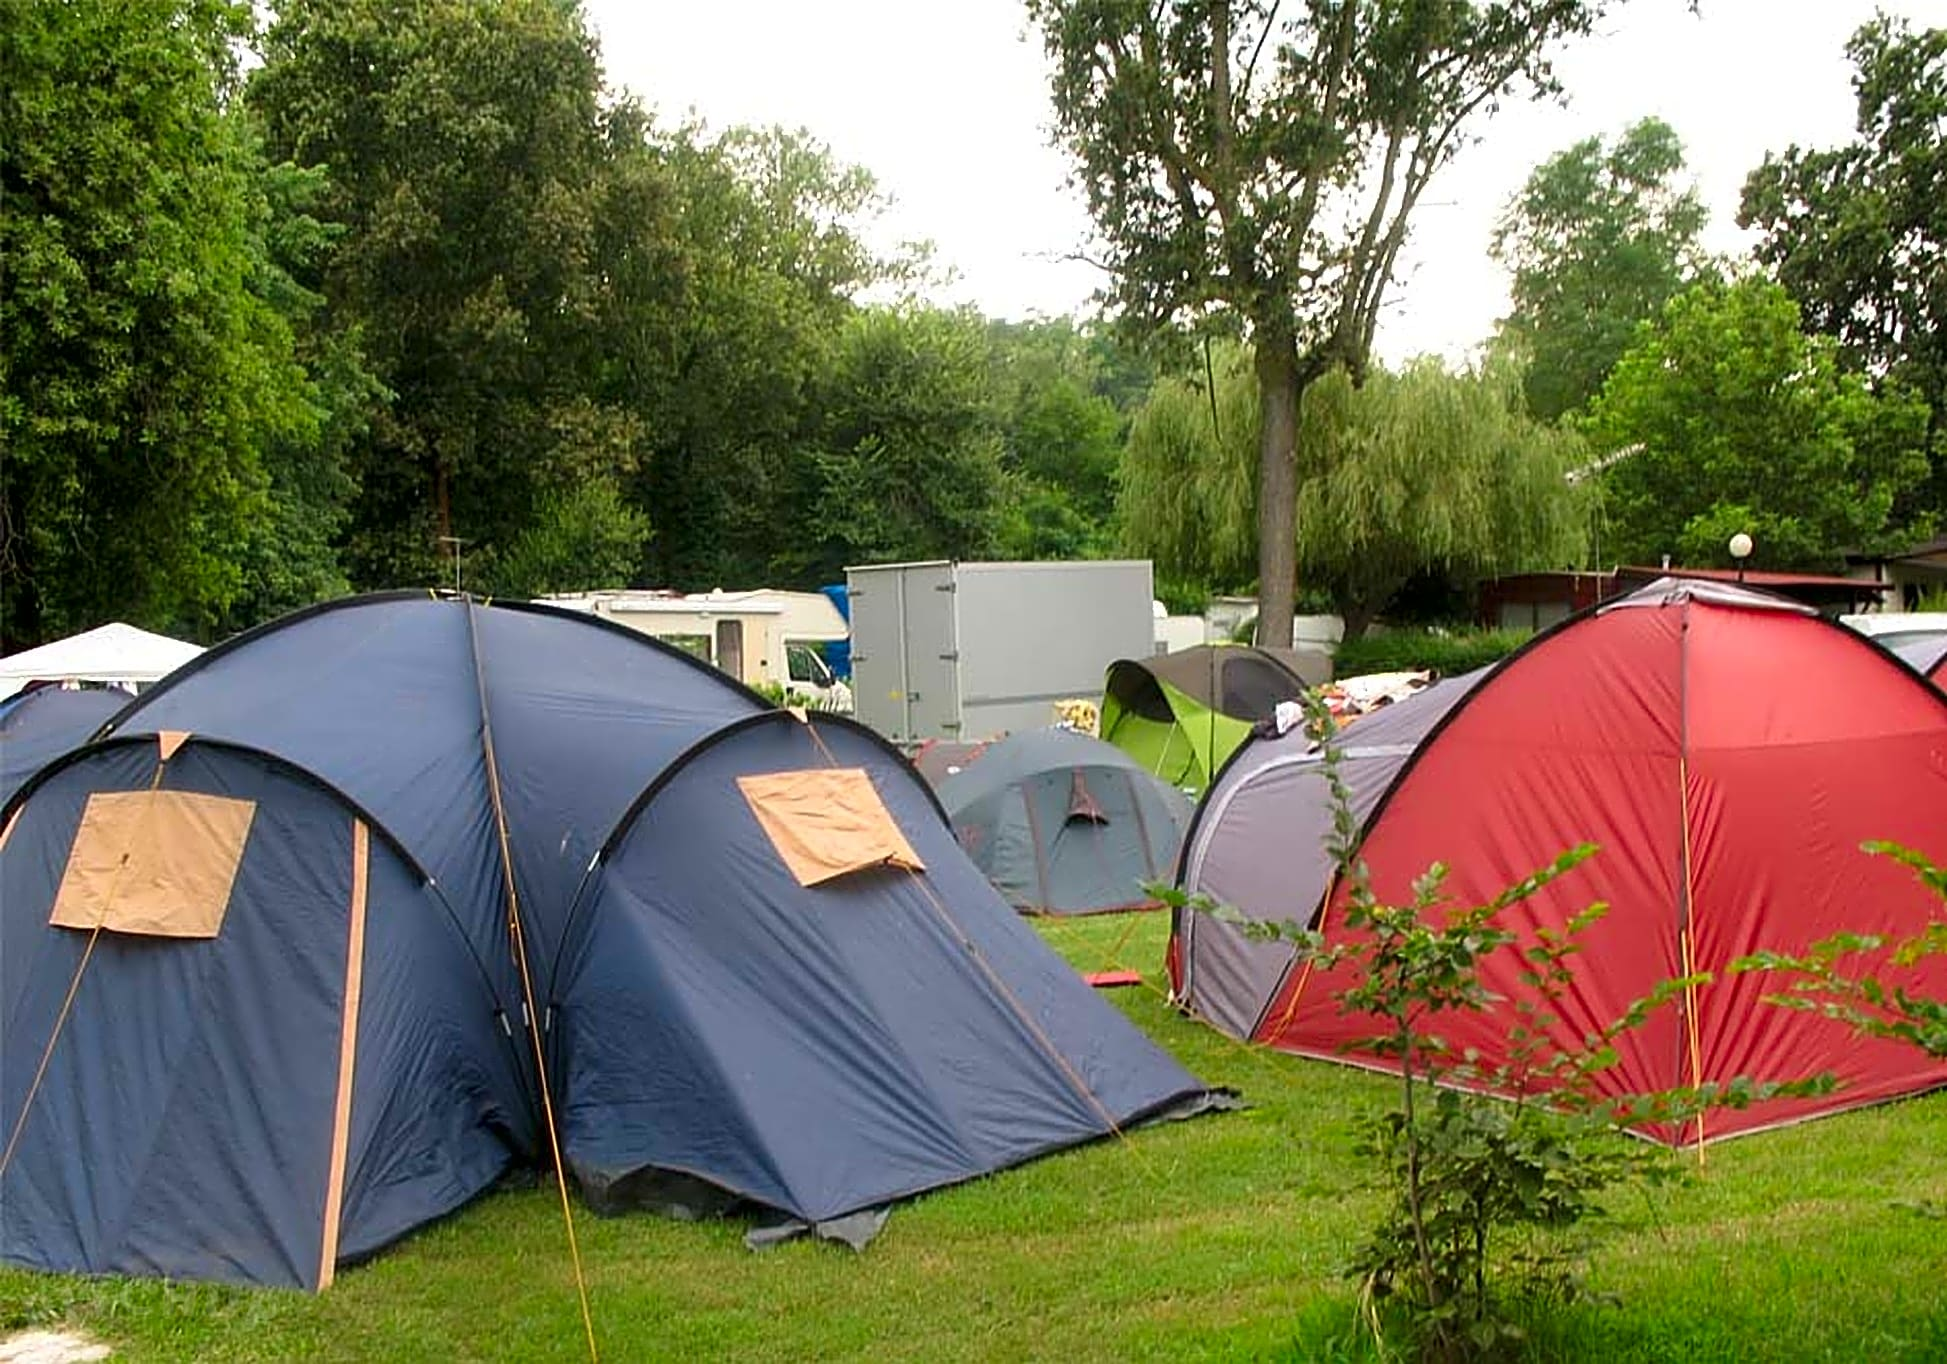 Camping Playa di Valverde, Galliate Oppdaterte priser for